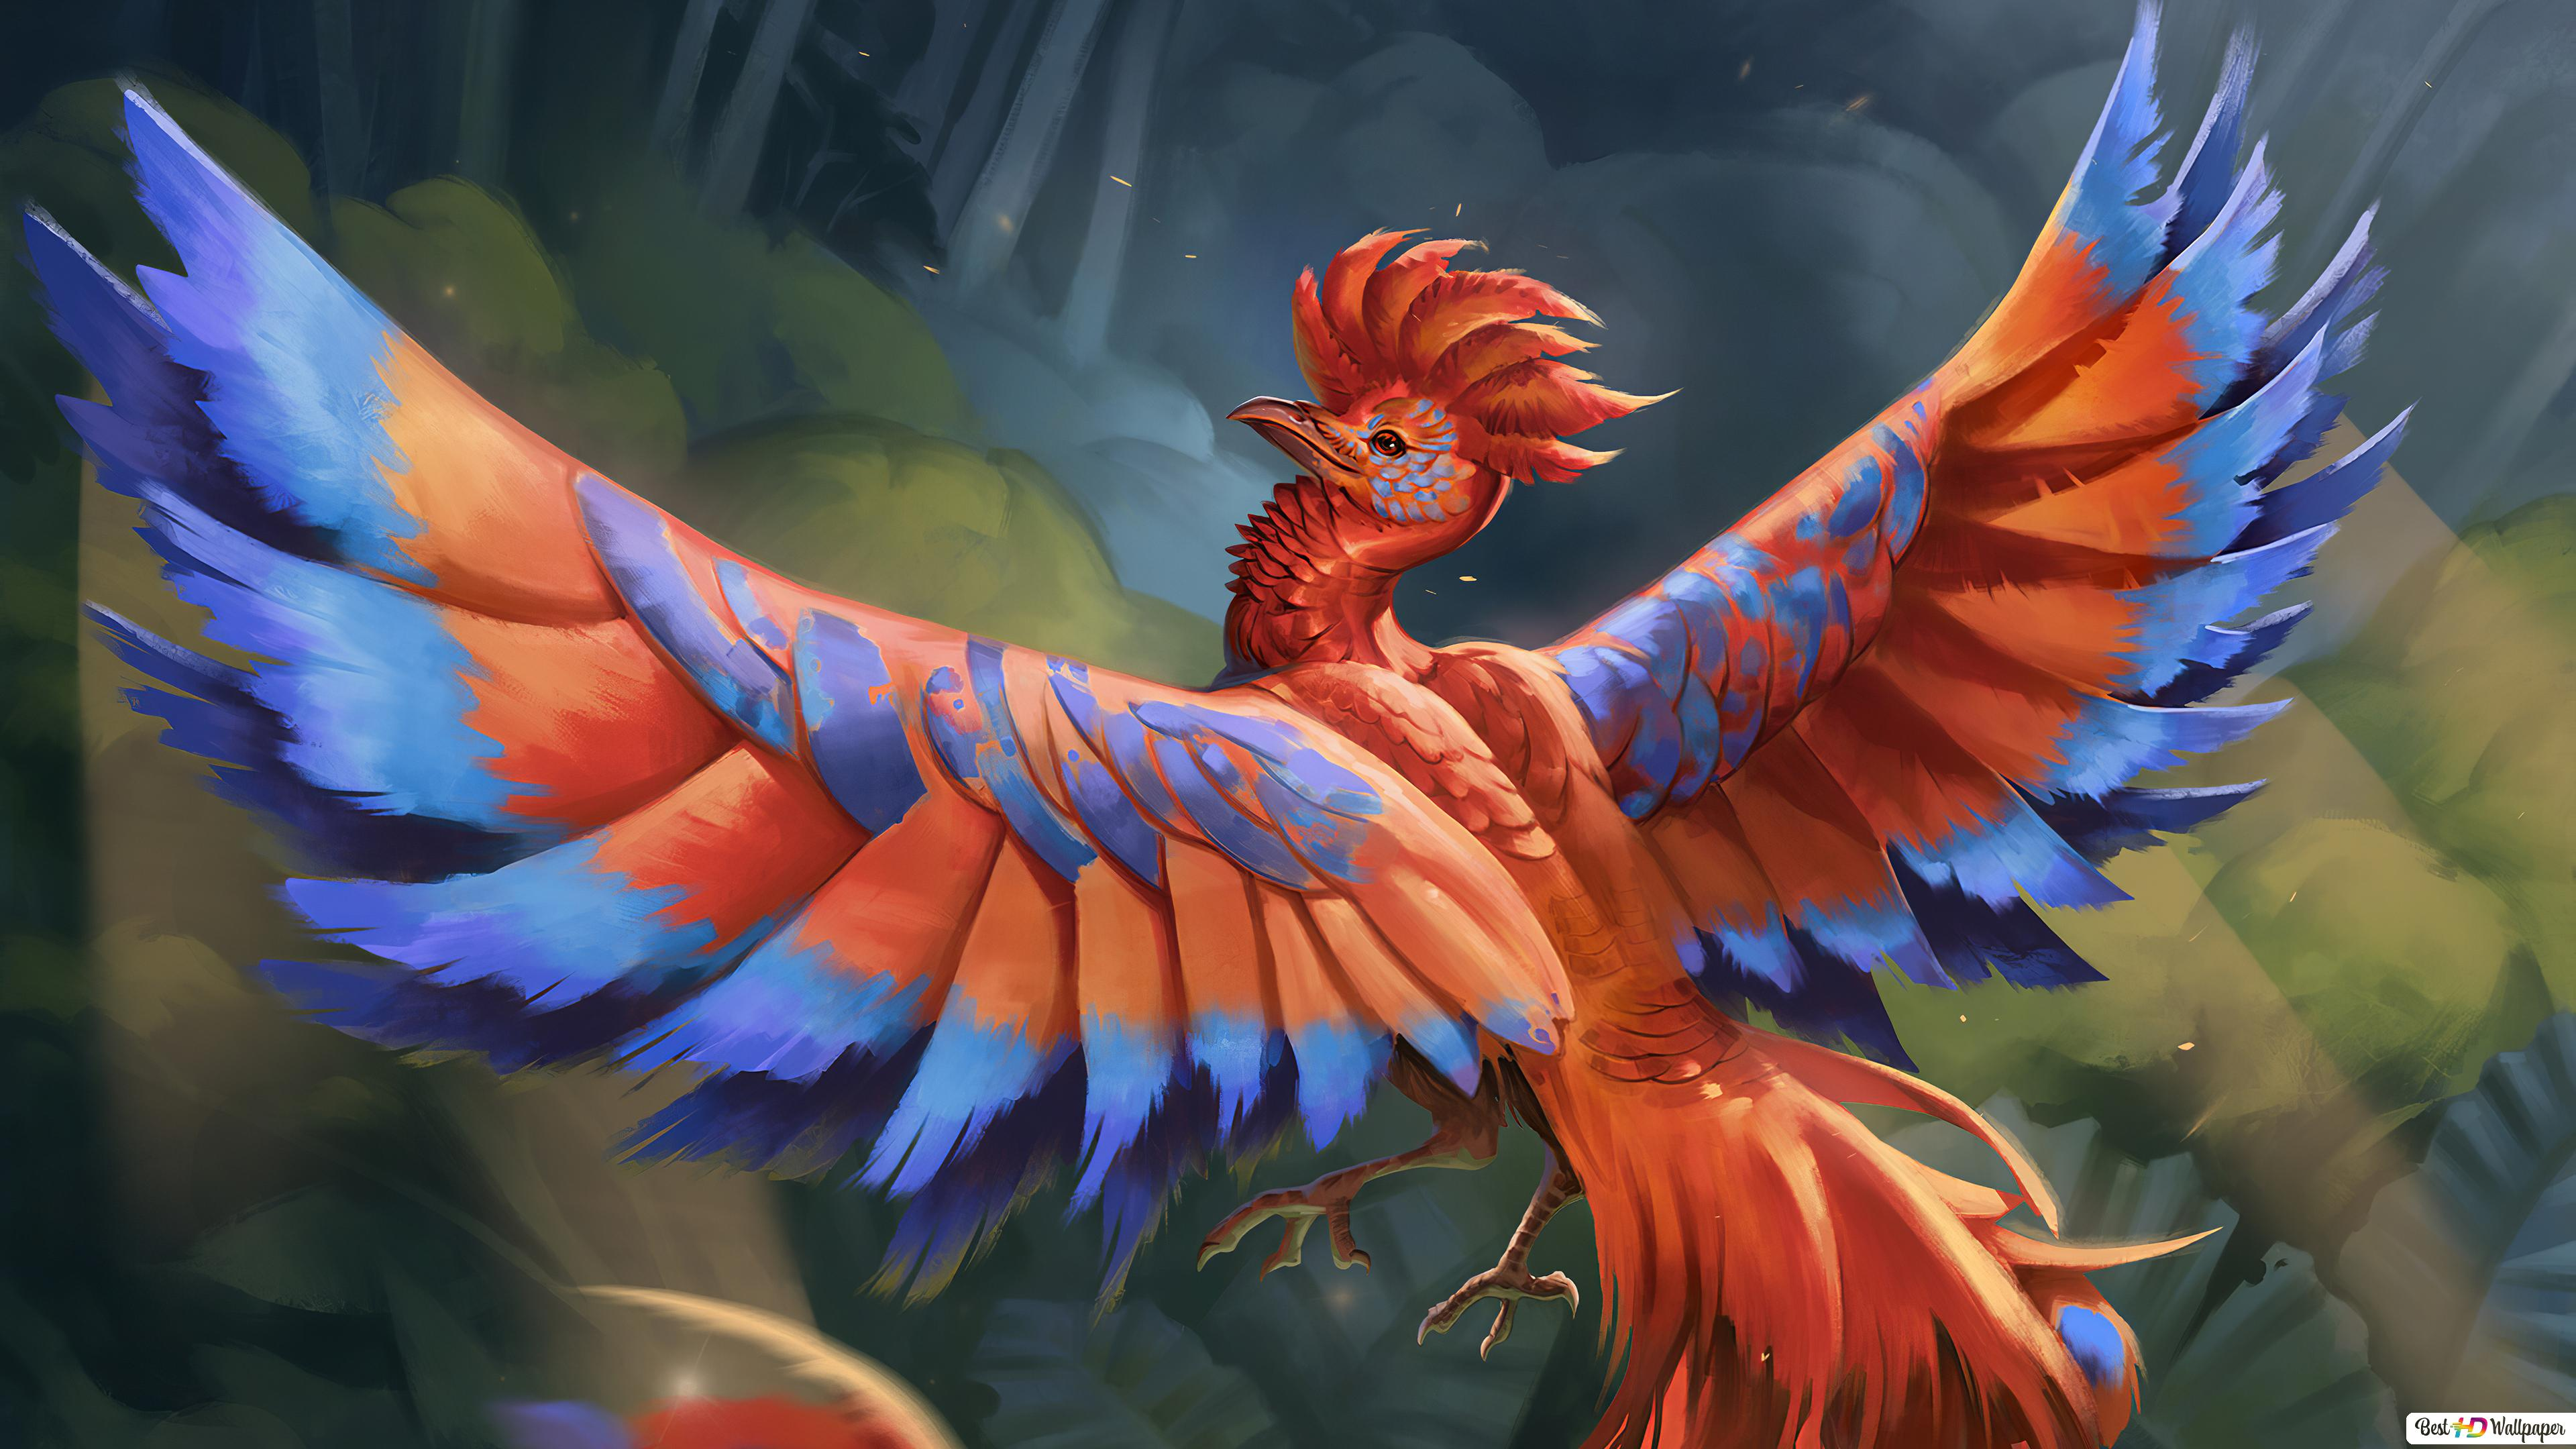 Digital Phoenix Hd Wallpaper Download